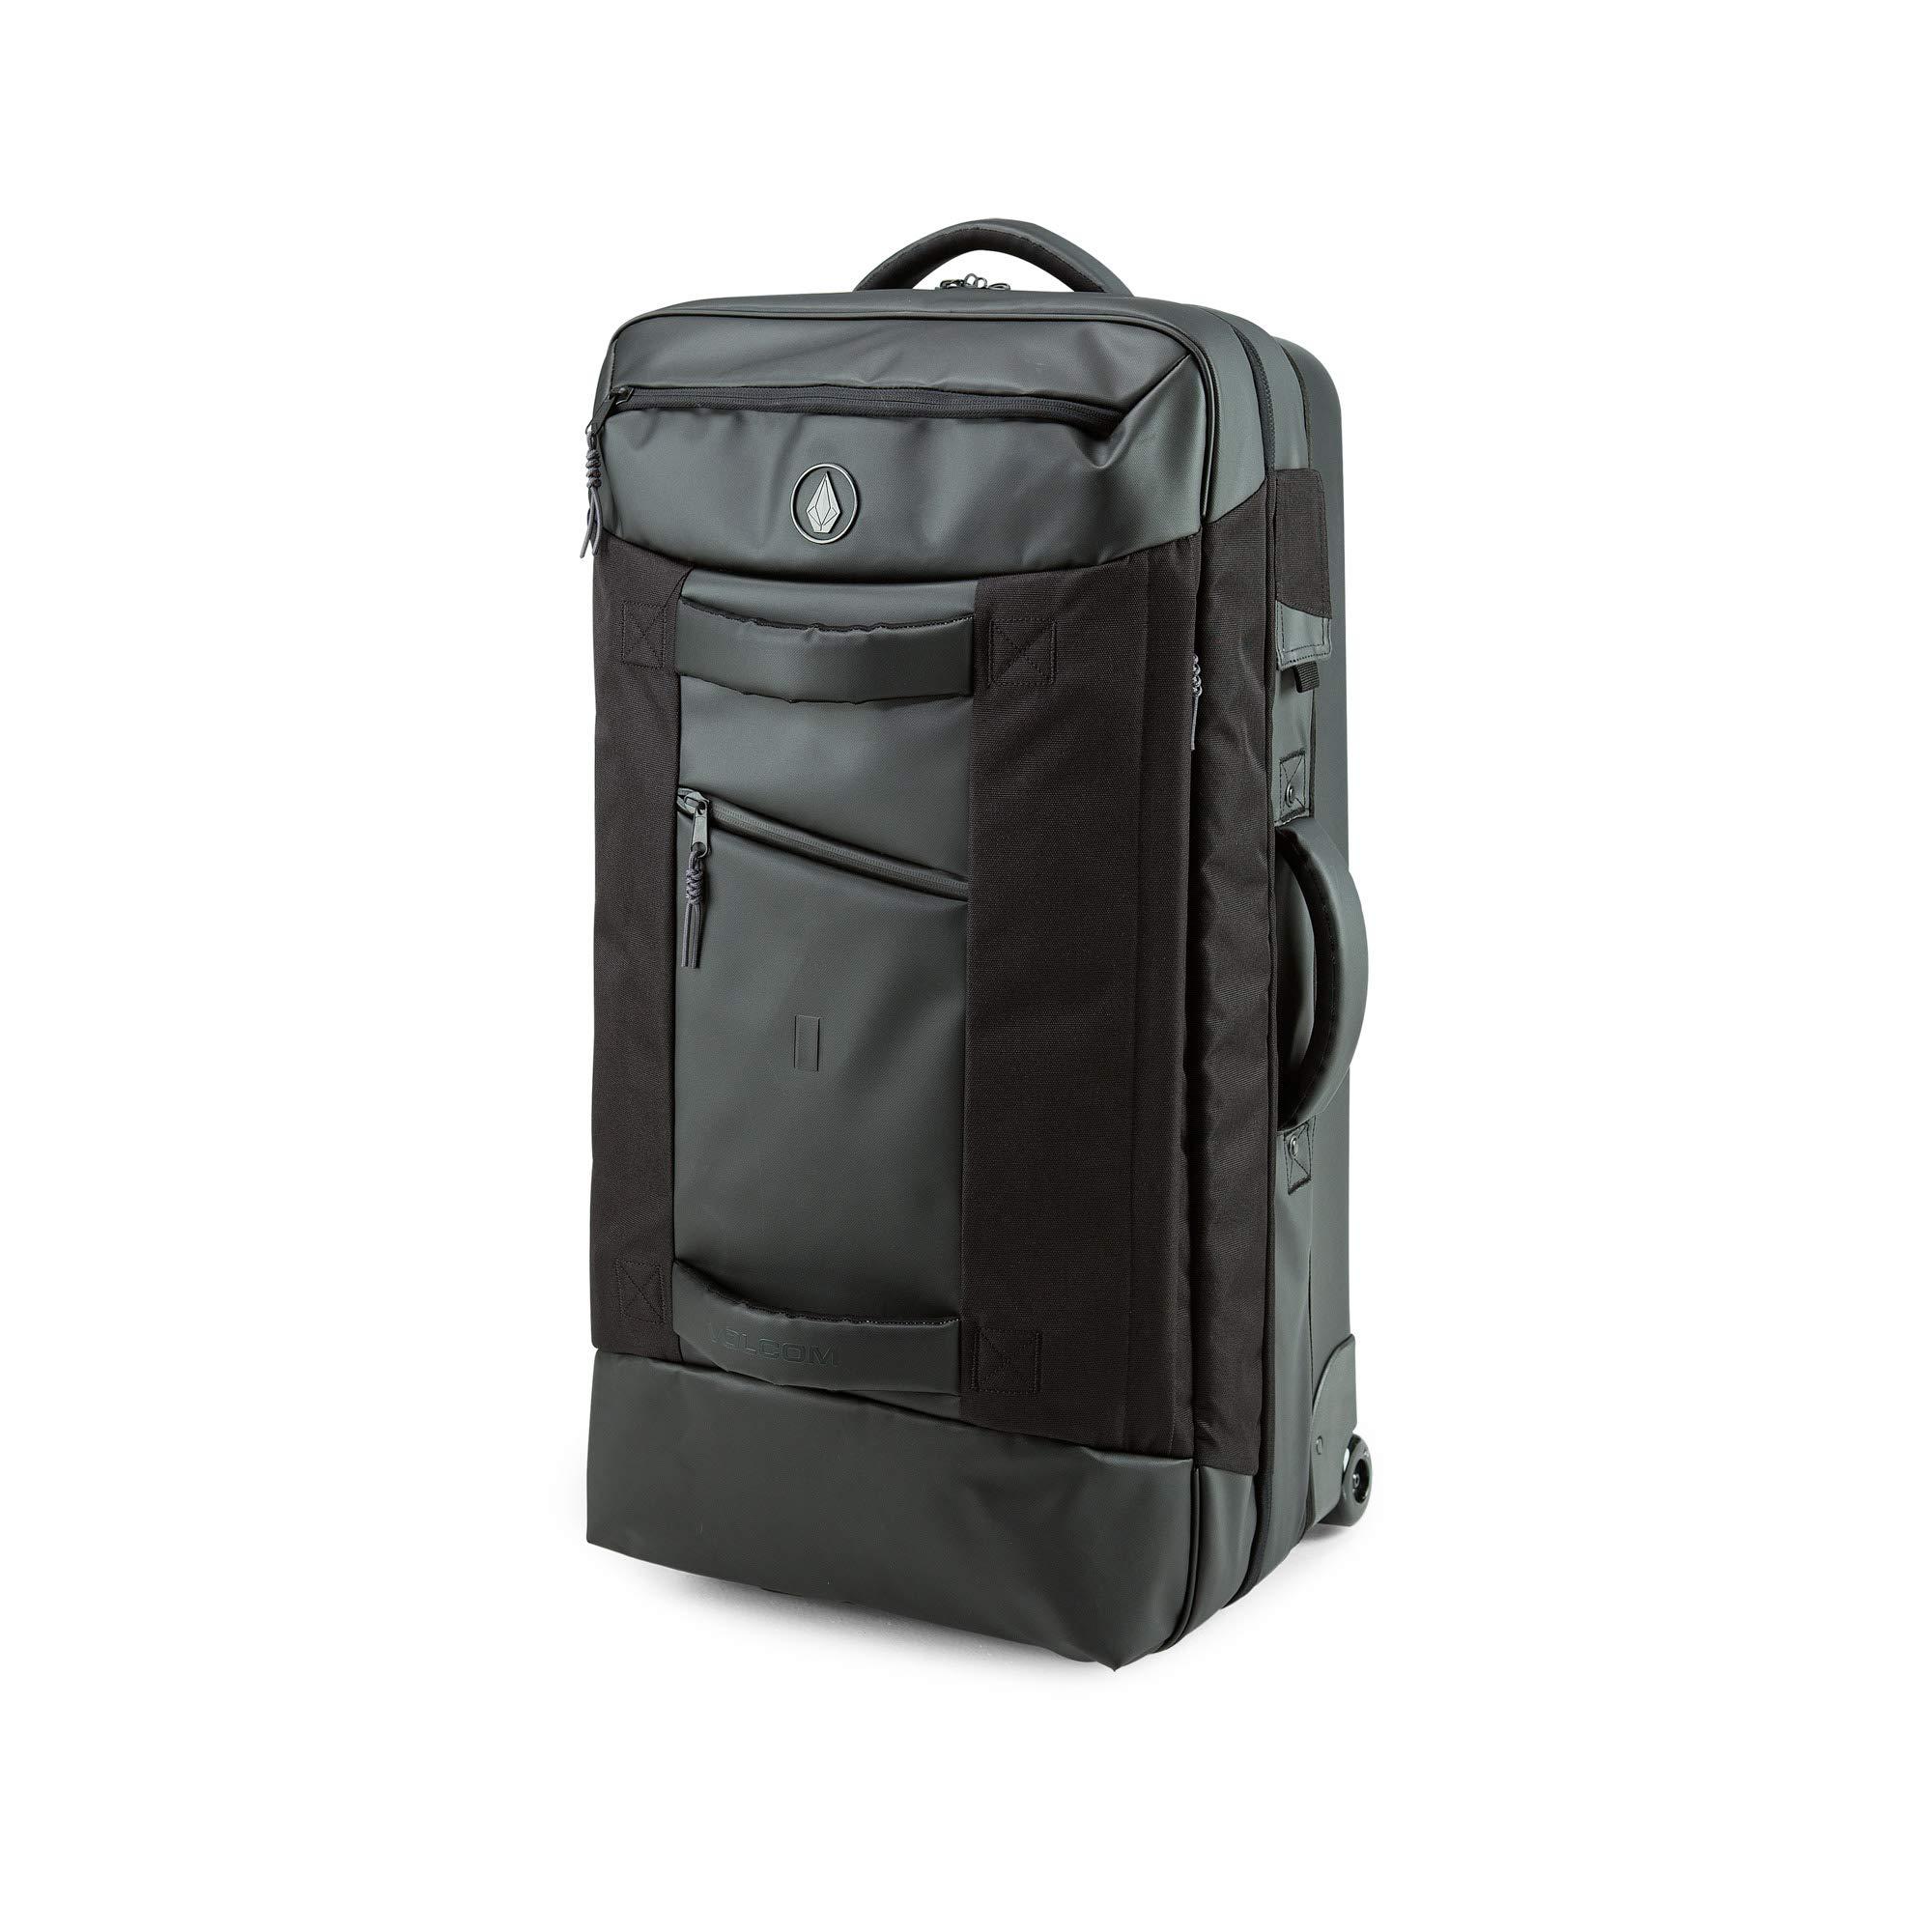 Volcom Men's International Bag, black, One Size